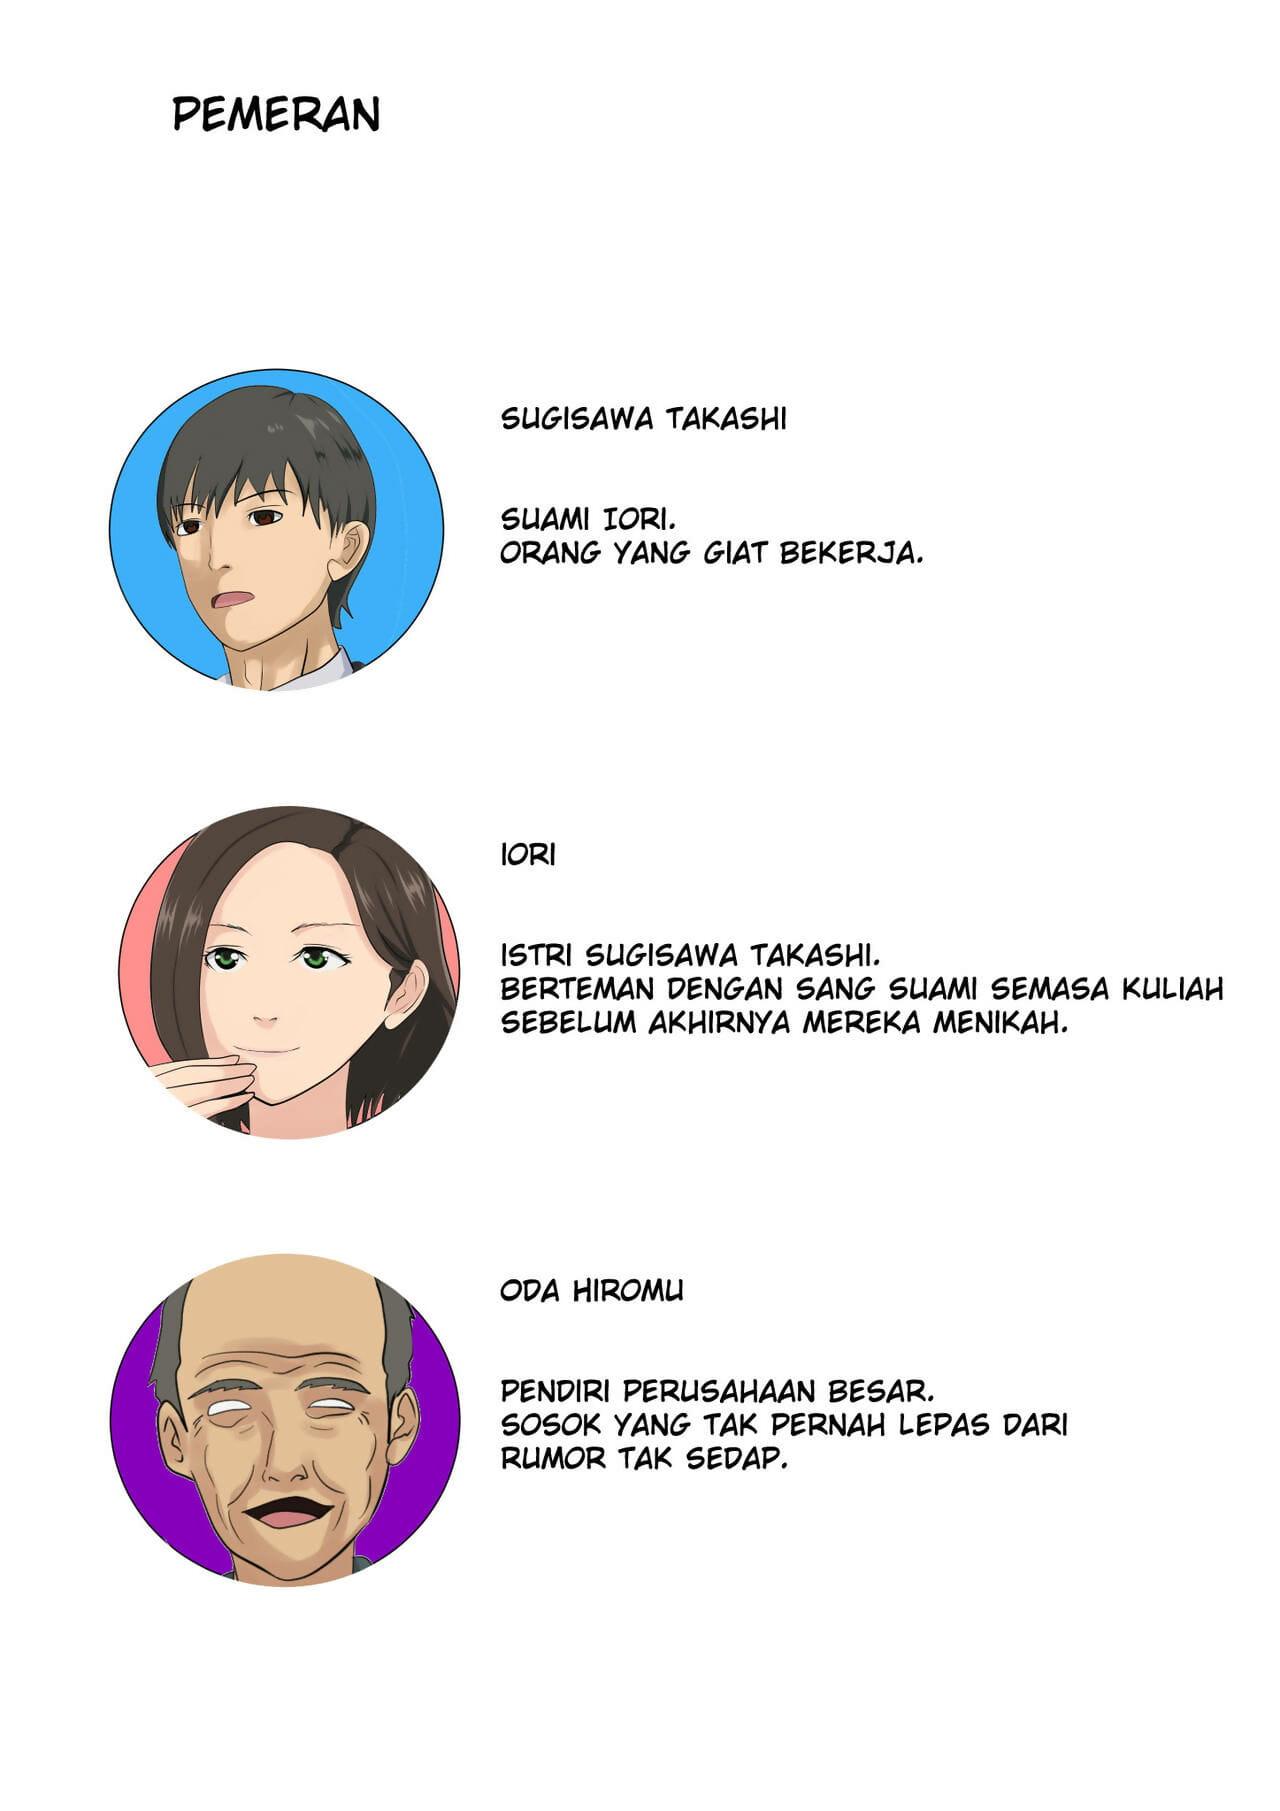 Kemusi Hardly any Bansan Kai Kyuukyoku doll-sized Act as Shokusareru Hitozuma Indonesian Kiyo21